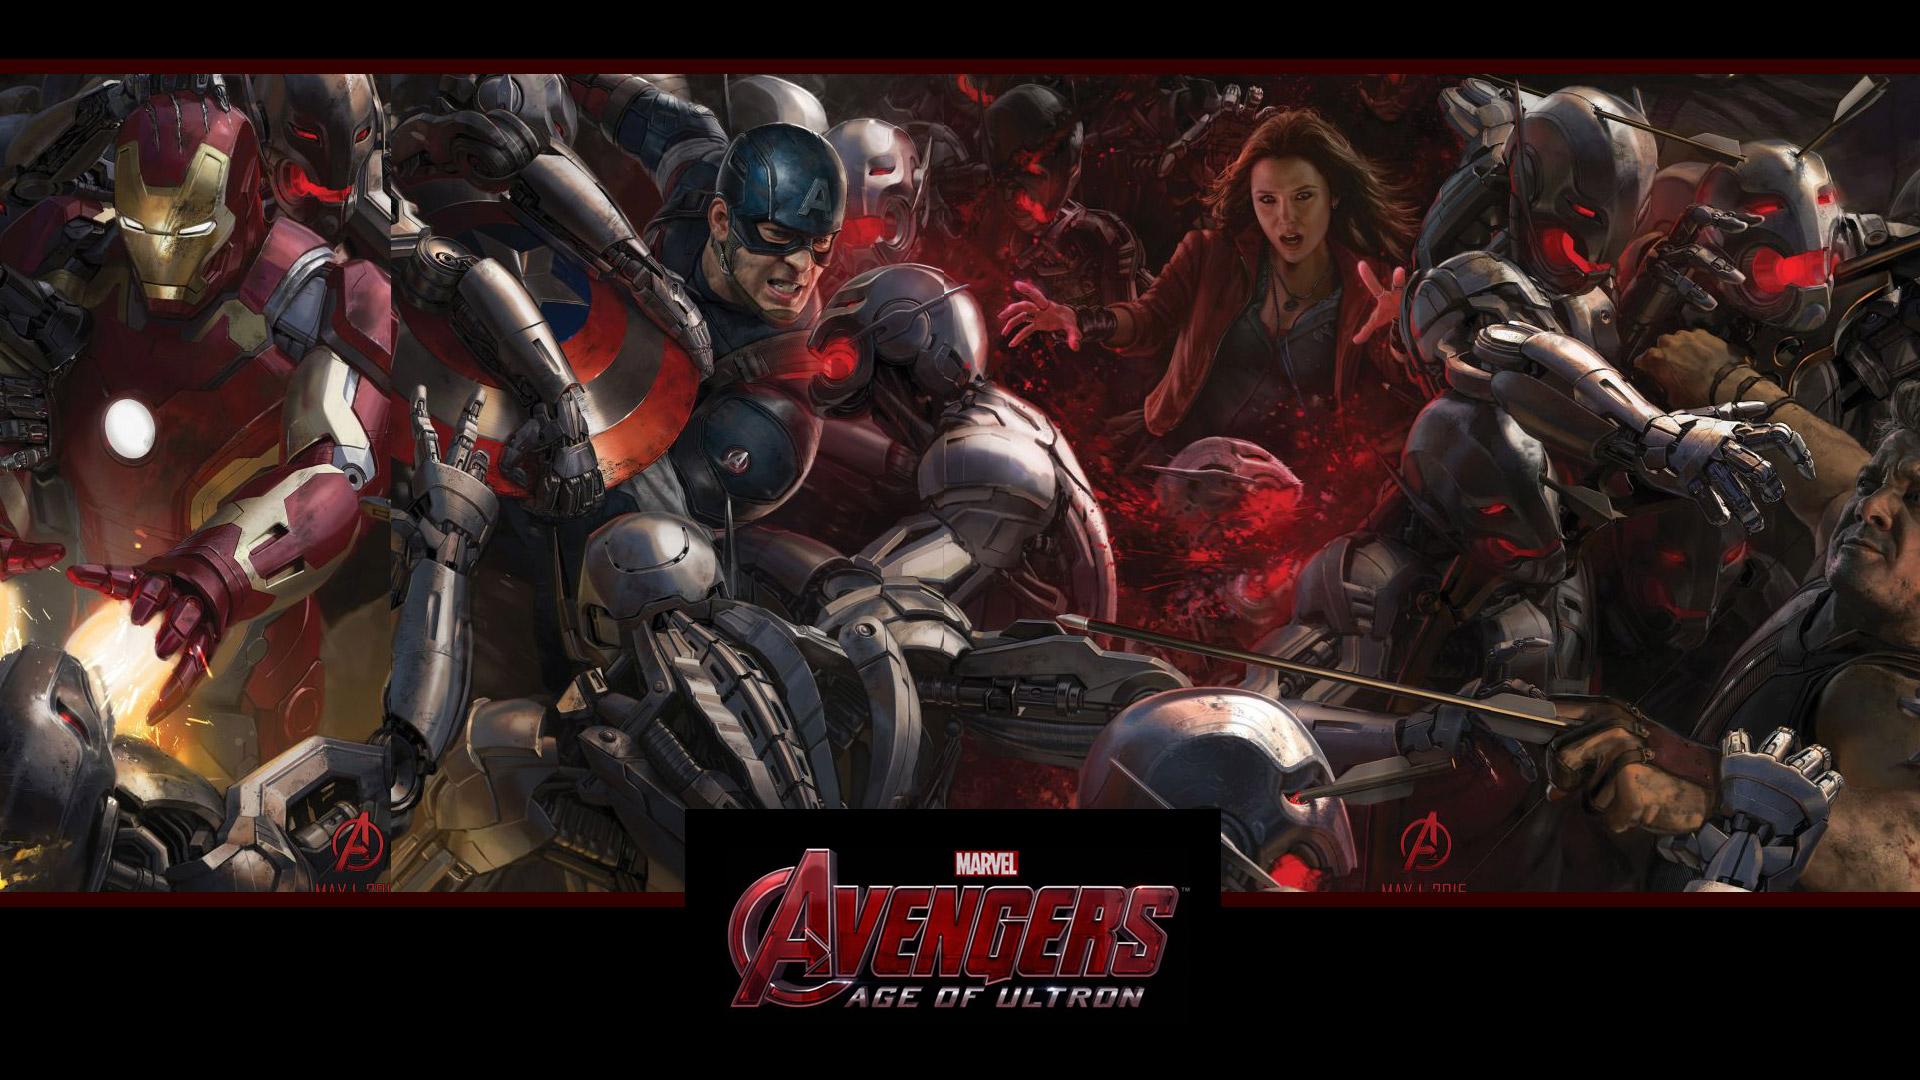 Avengers 2 Age of Ultron Wallpaper HD 1920x1080